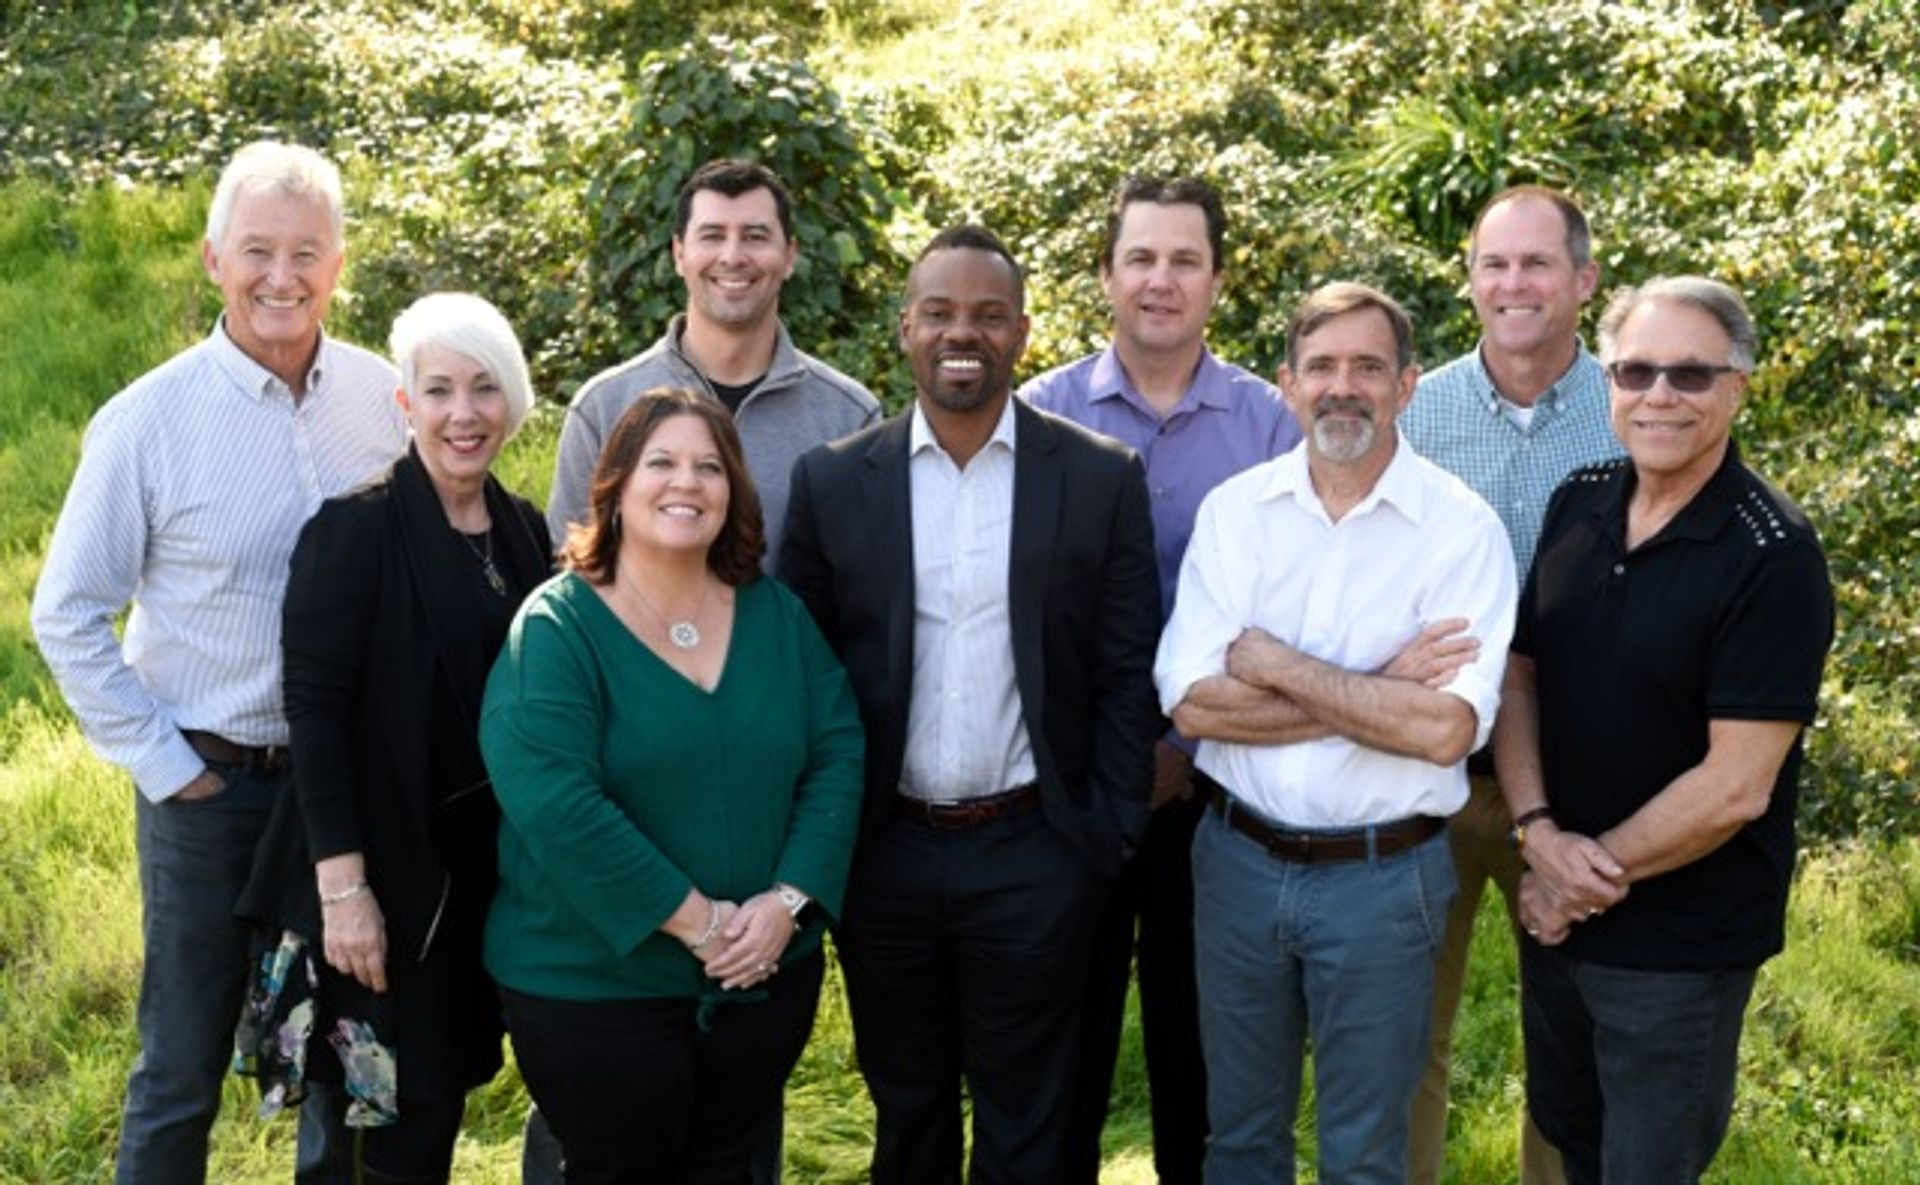 Downtown Roseville Partnership Board & Staff